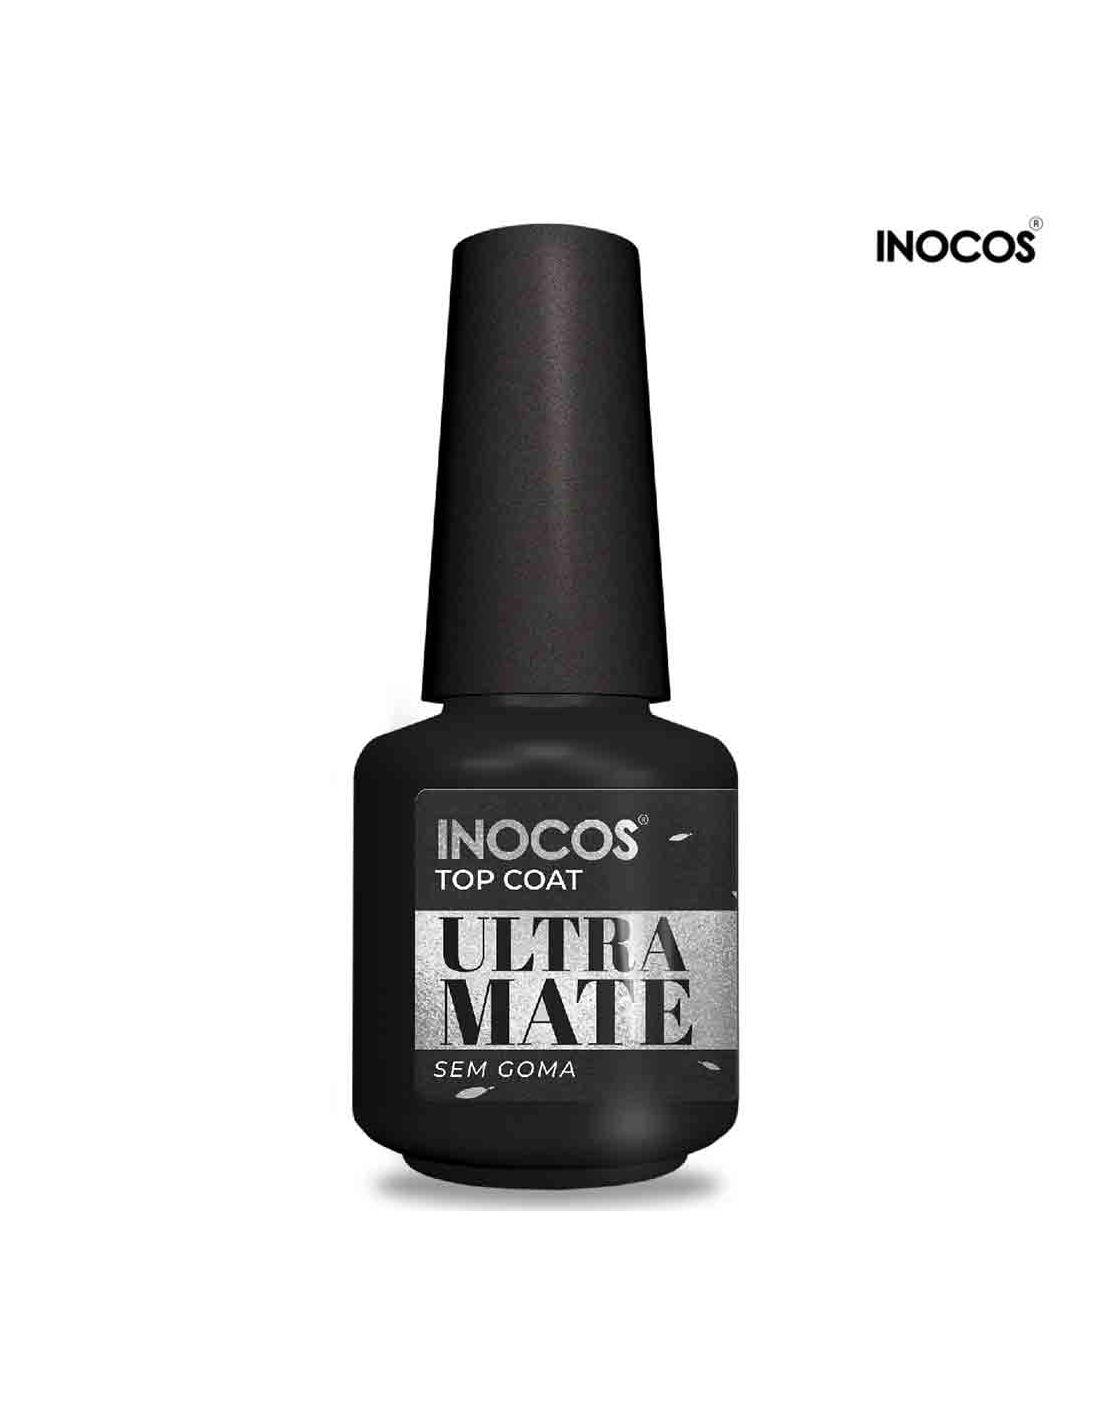 Ultra Mate Inocos